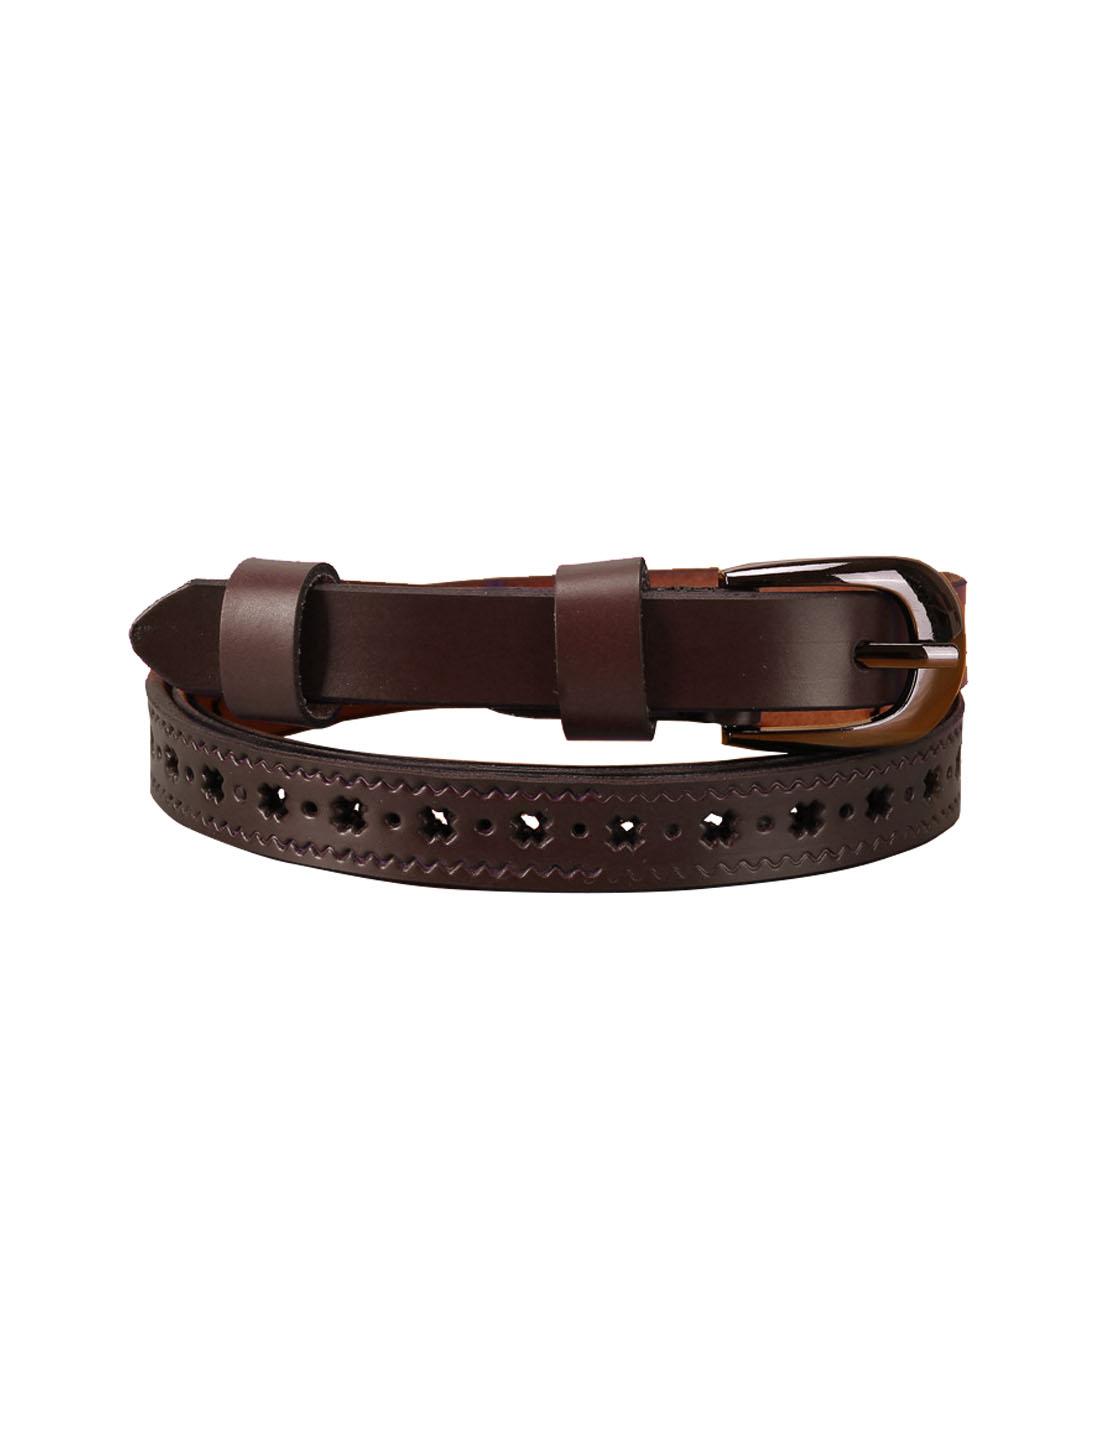 Women Stars Hollow Alloy Pin Buckle Faux Leather Belt Dark Brown